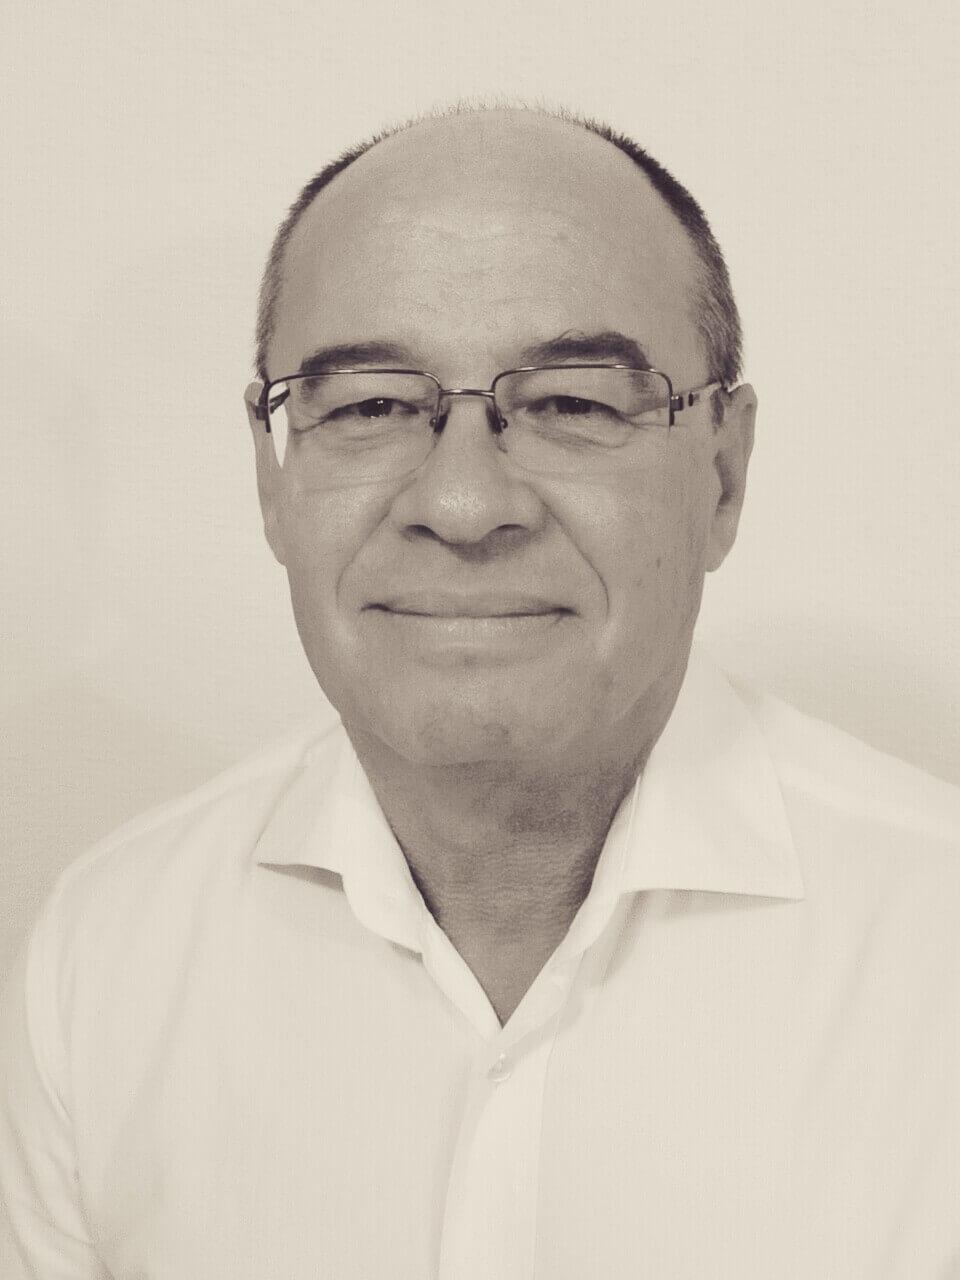 José Luis Pérez Aranda, autor de Ediciones Atlantis